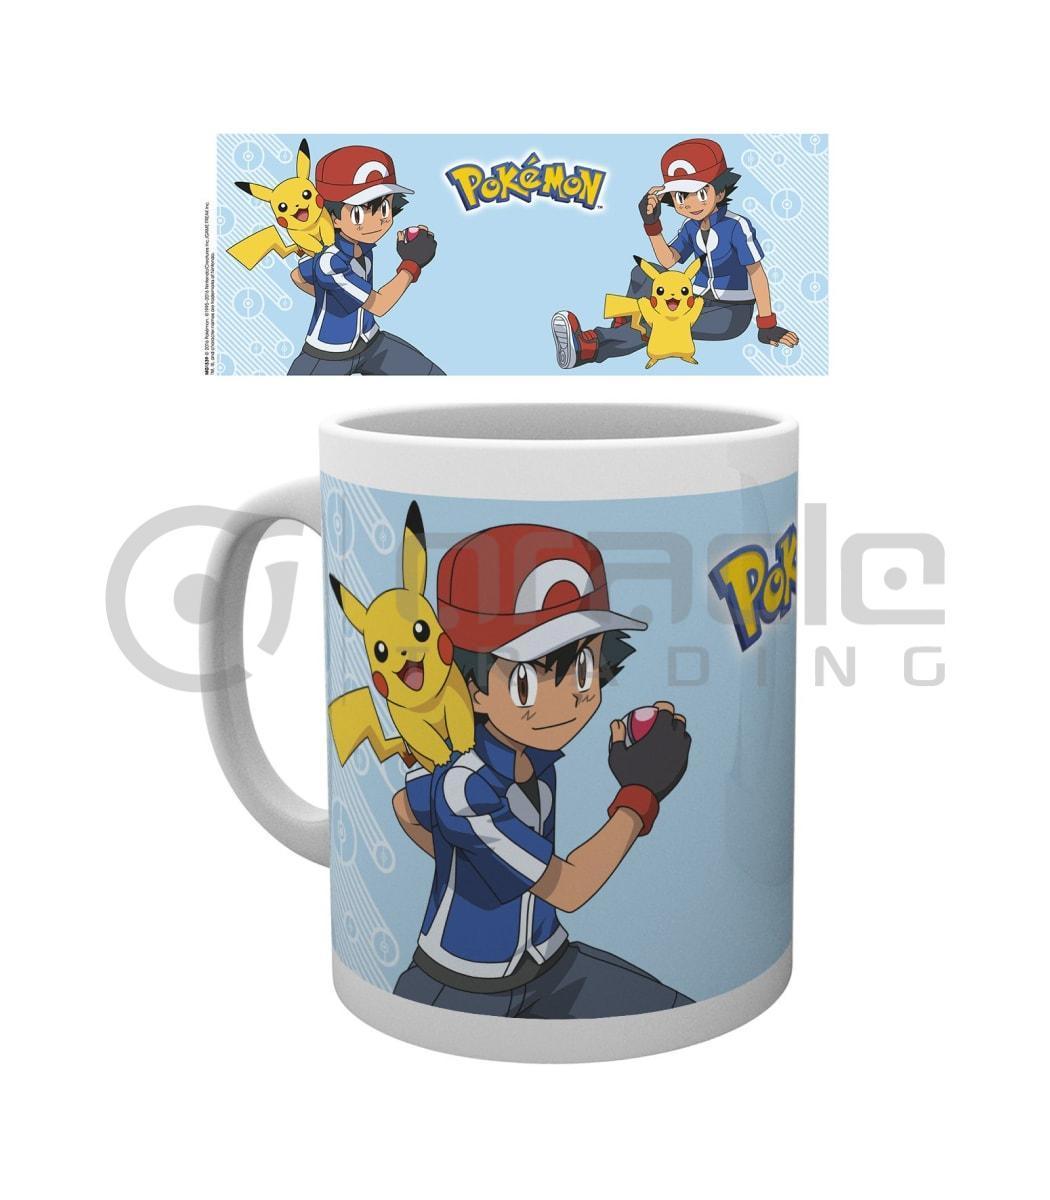 Pokémon Mug - Ash